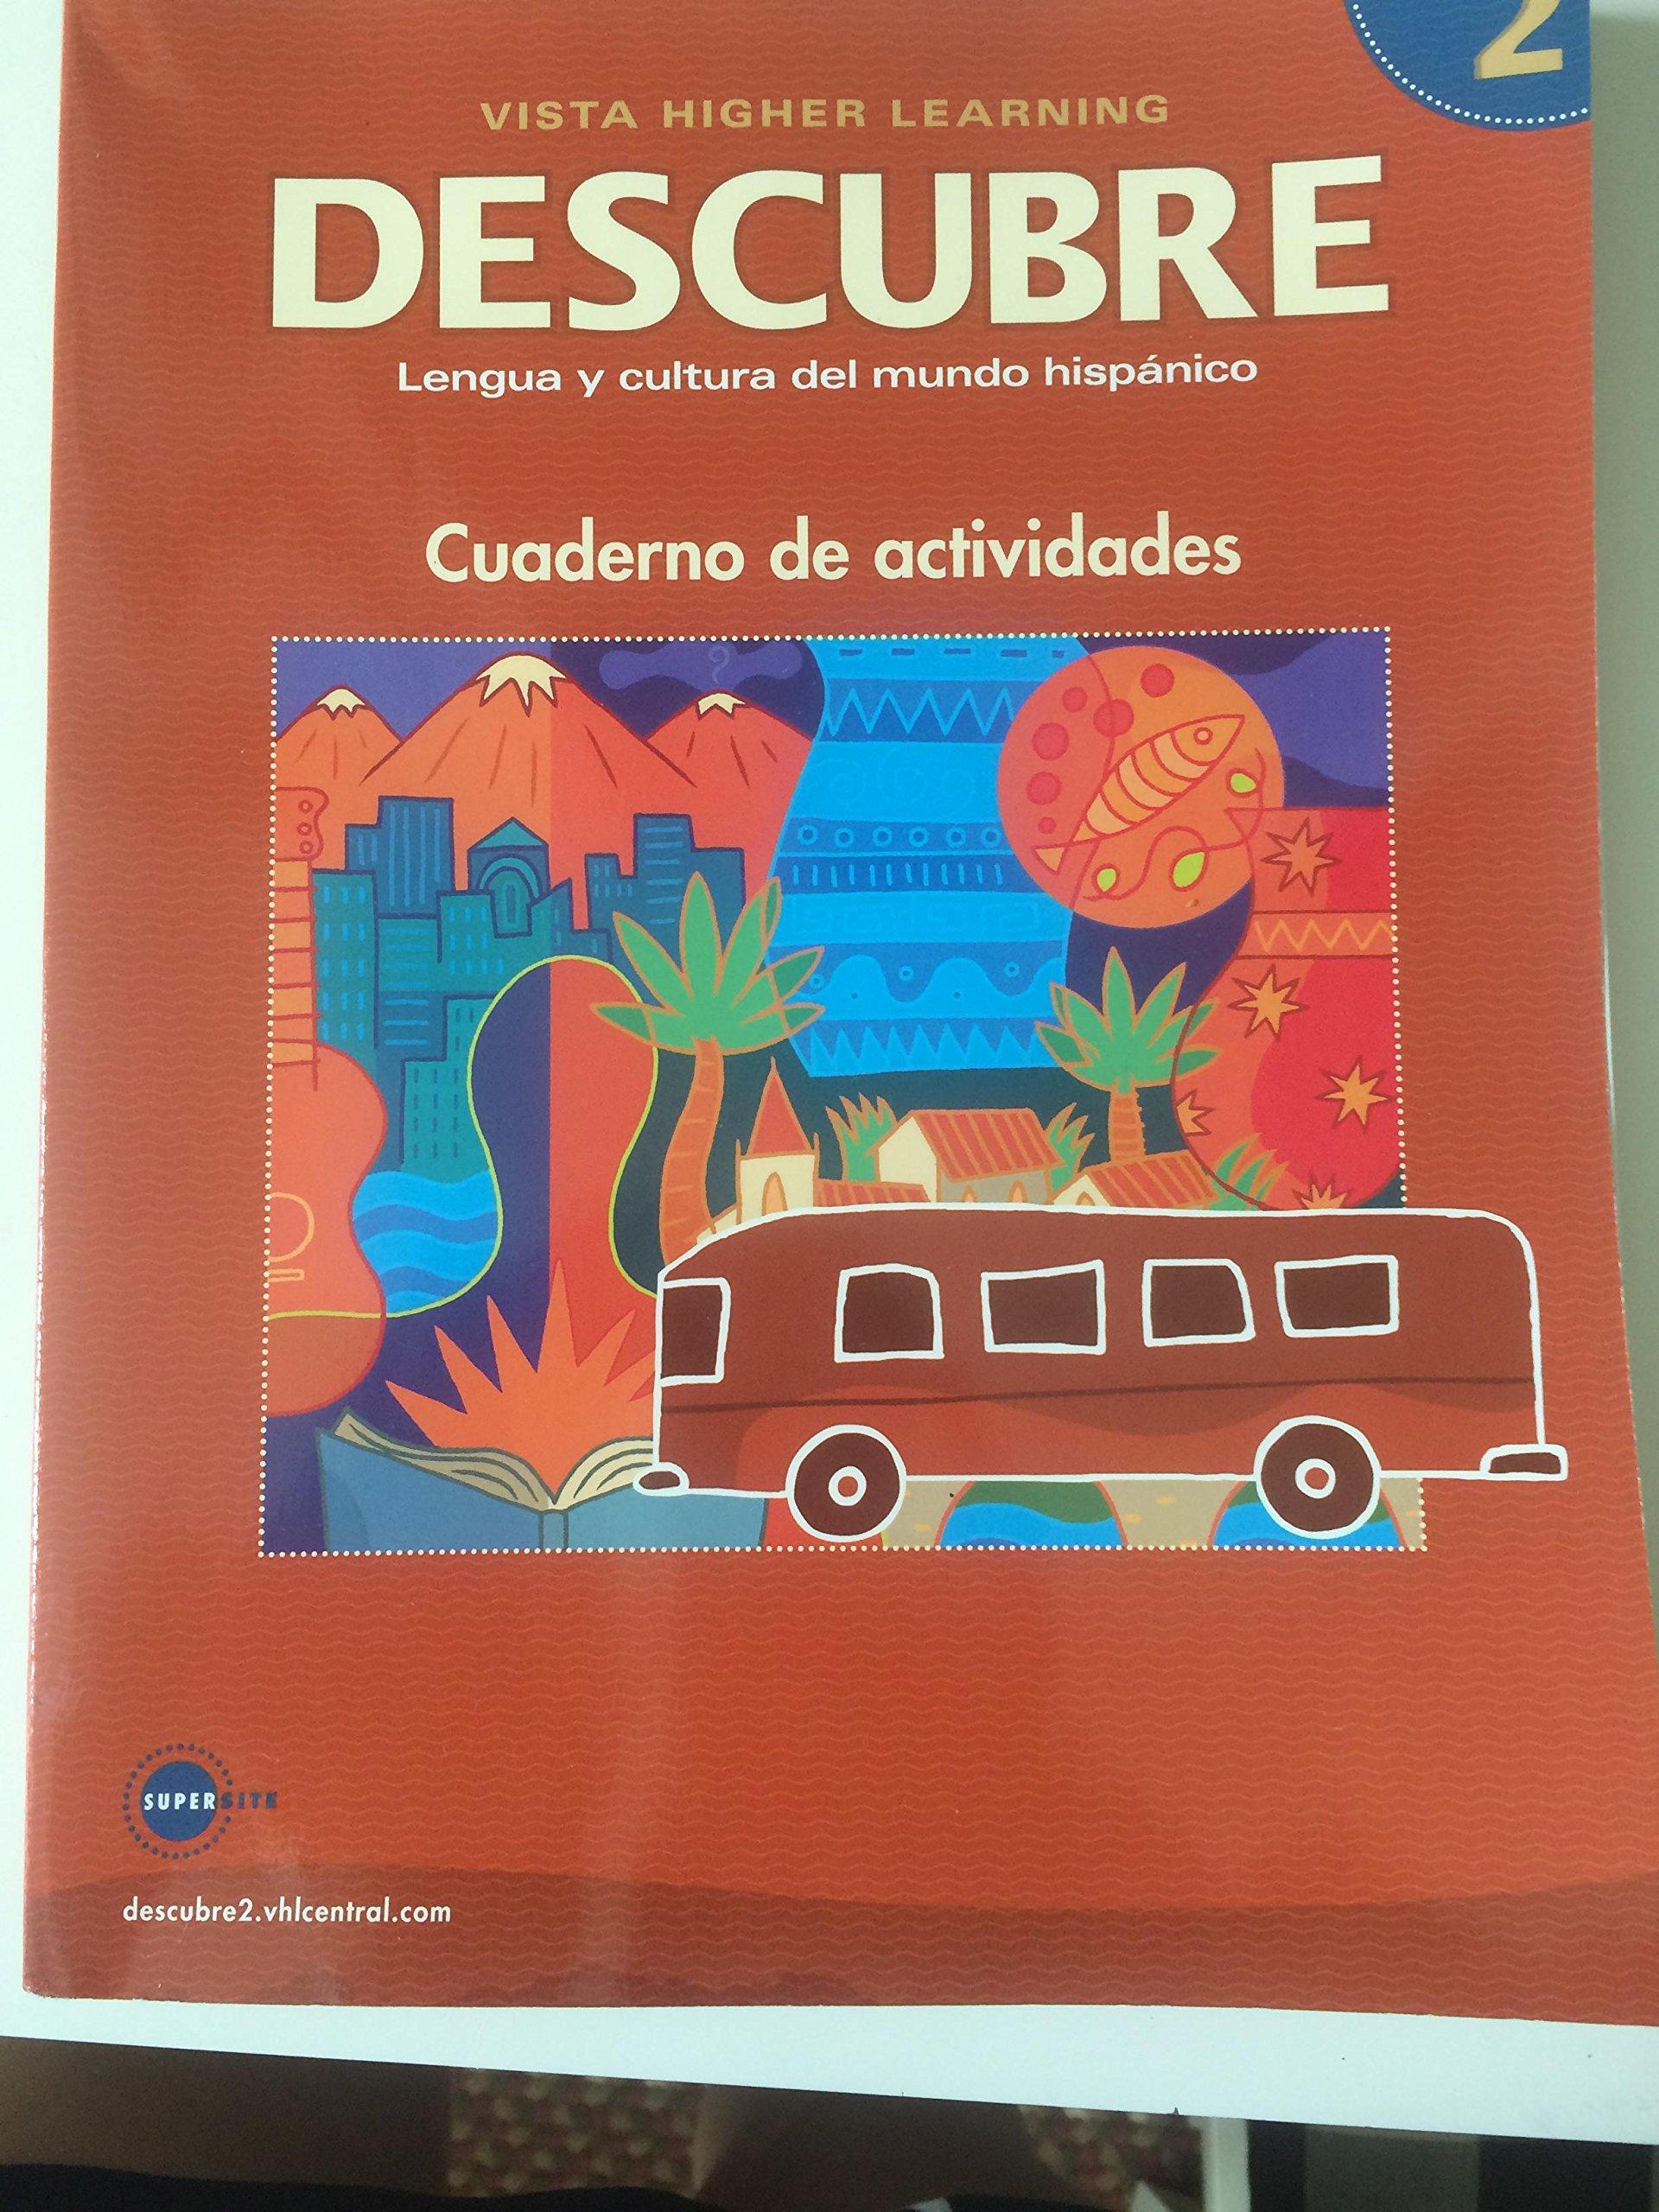 DESCUBRE, nivel 2 - Lengua y cultura del mundo hispánico - Student  Activities Book (Spanish and English Edition): Jose A. Blanco, Philip  Redwine Donley: ...